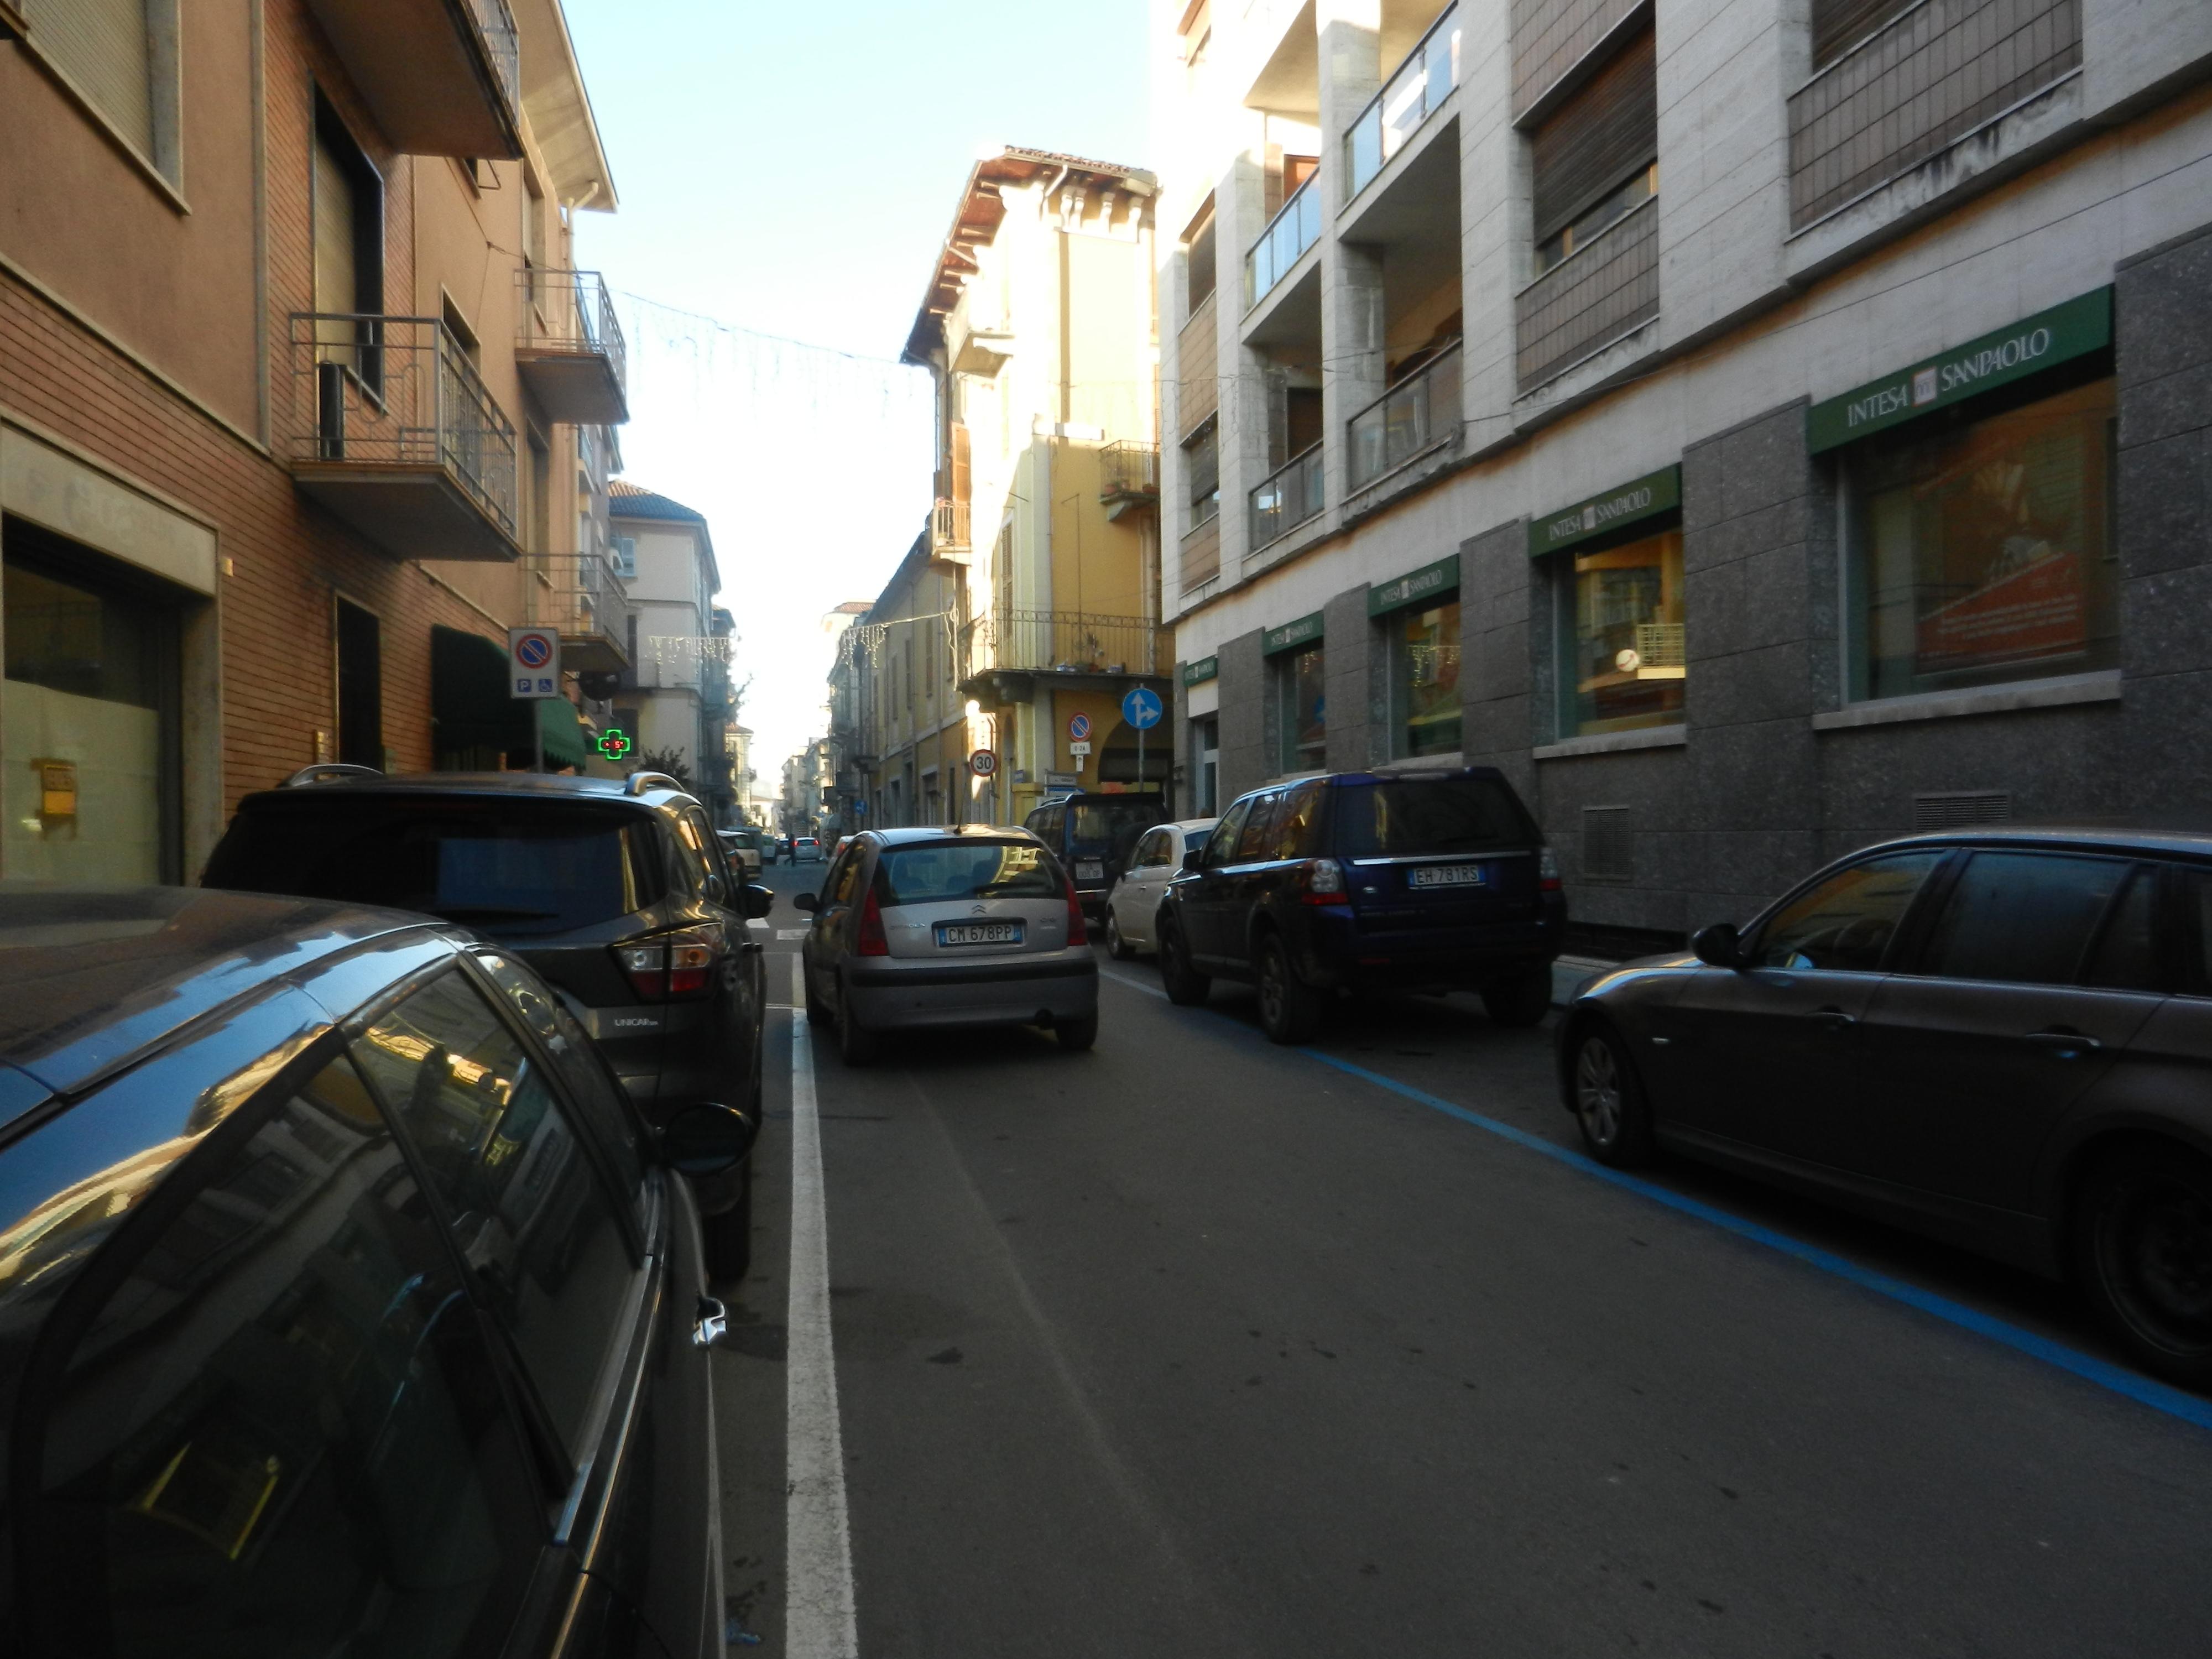 Nizza Monferrato, via Pio Corsi